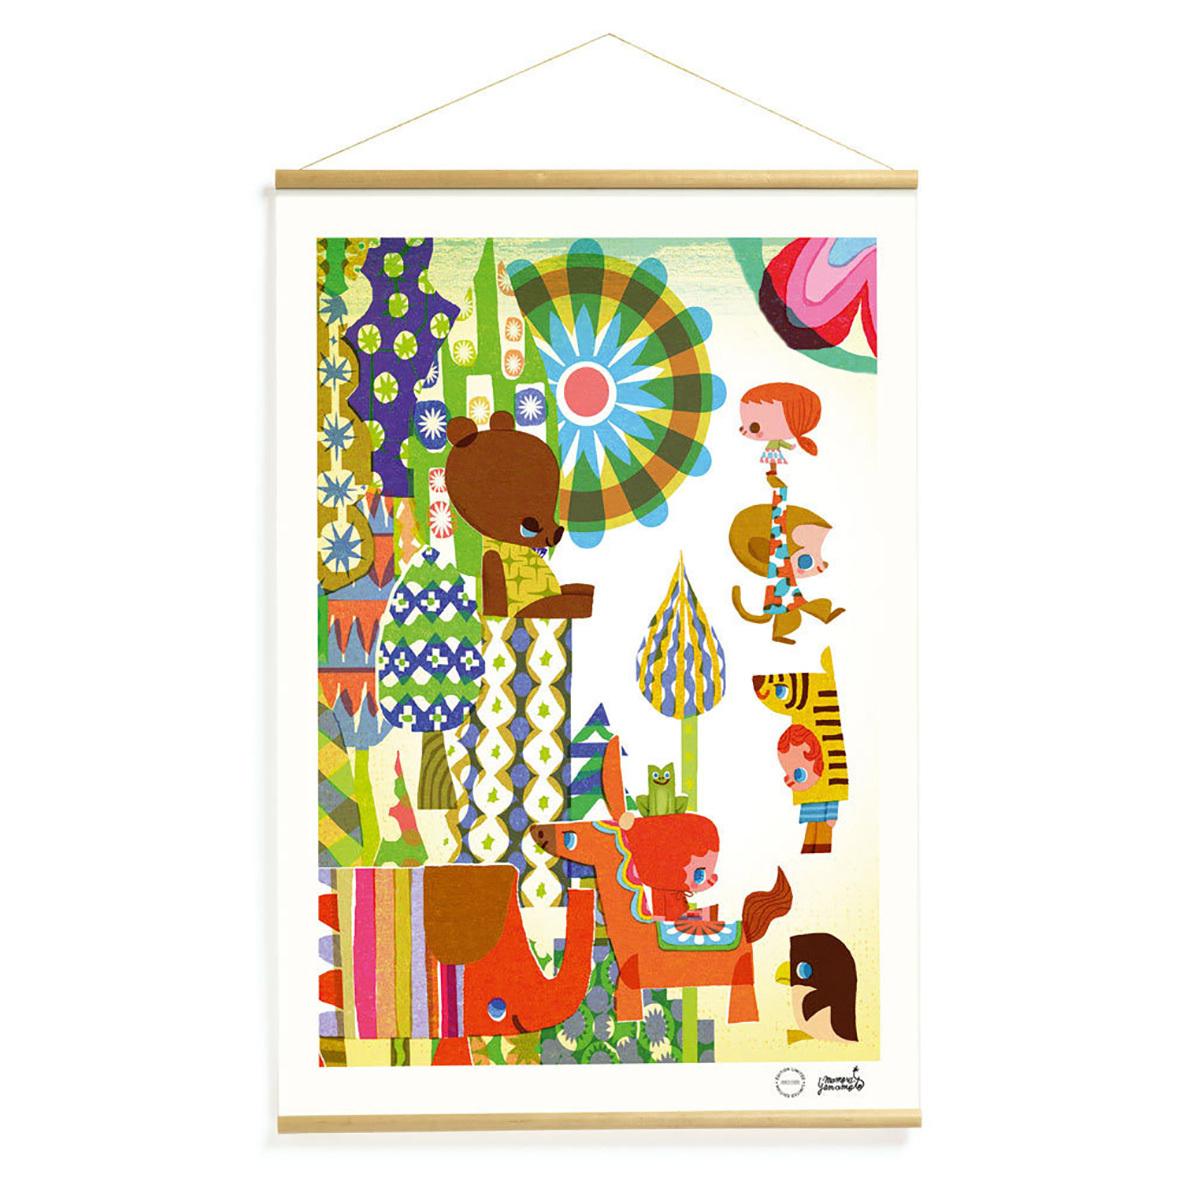 Affiche & poster Colored Story Kakemonos Colored Story Kakemonos